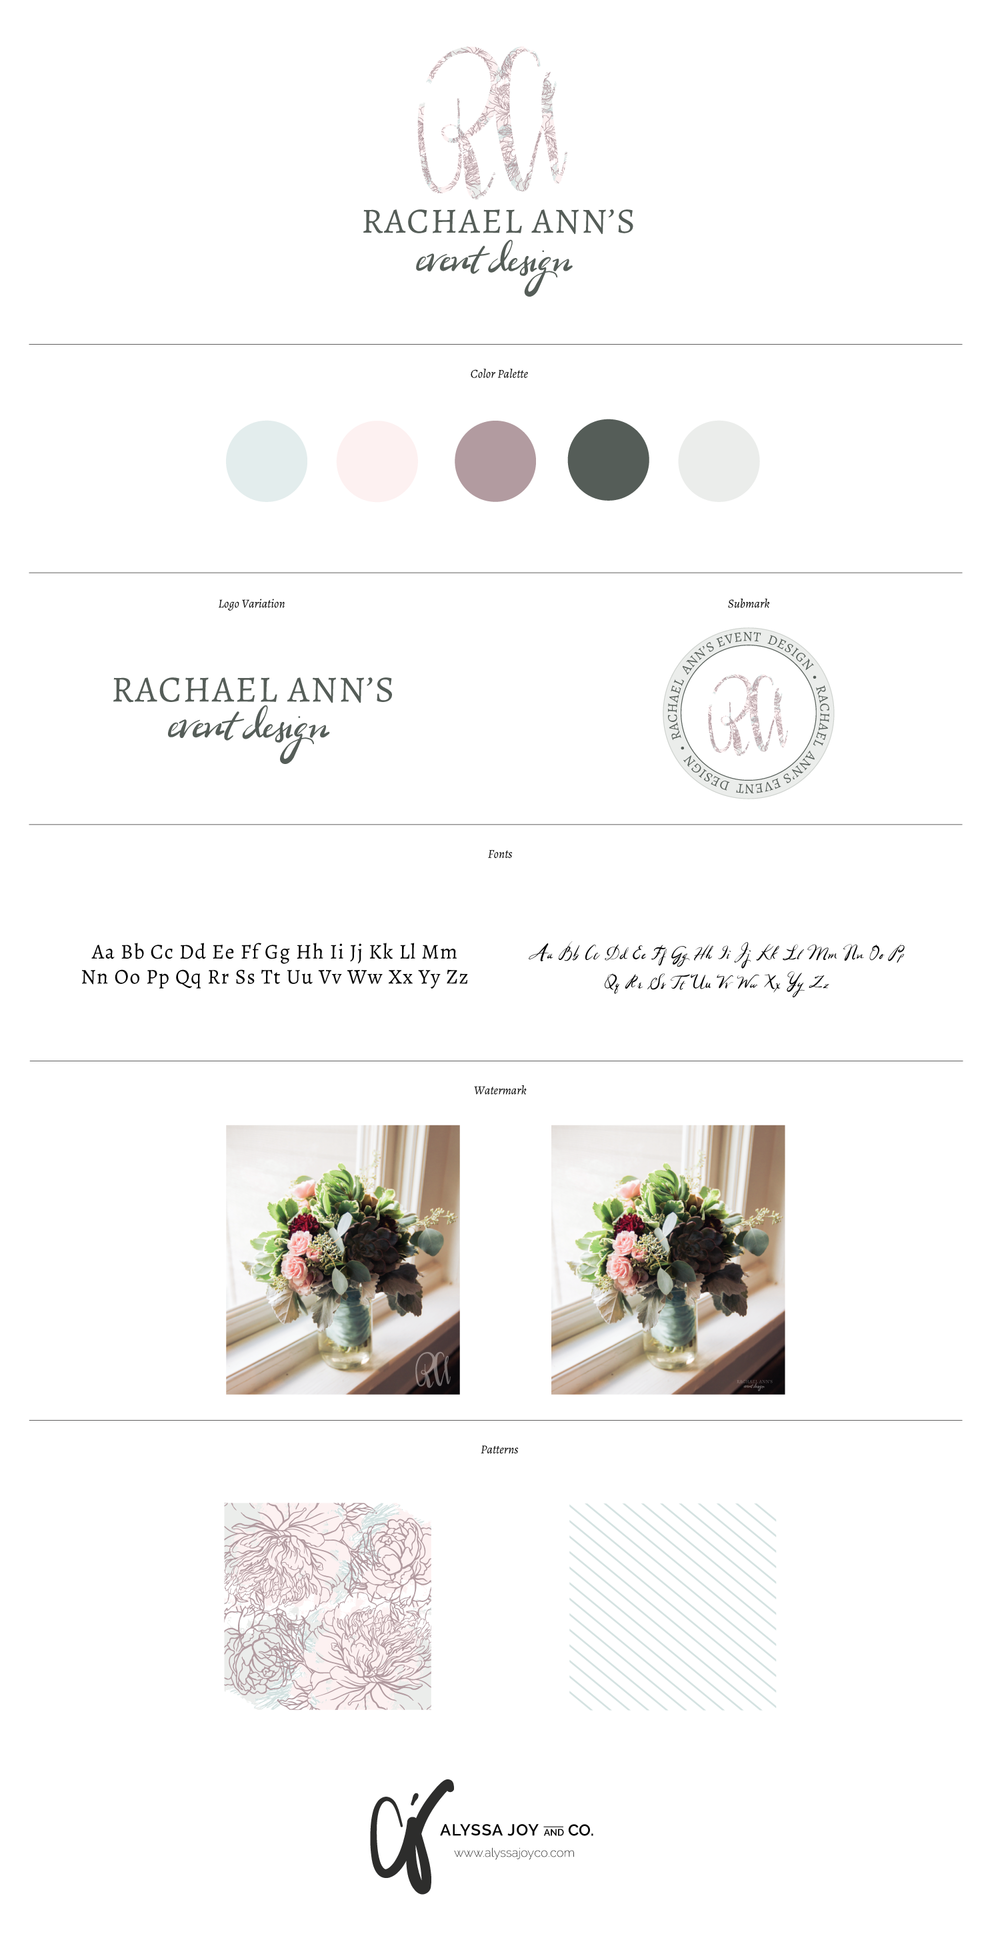 Alyssa Joy & Co.    Branding for Rachael Ann's Event Design